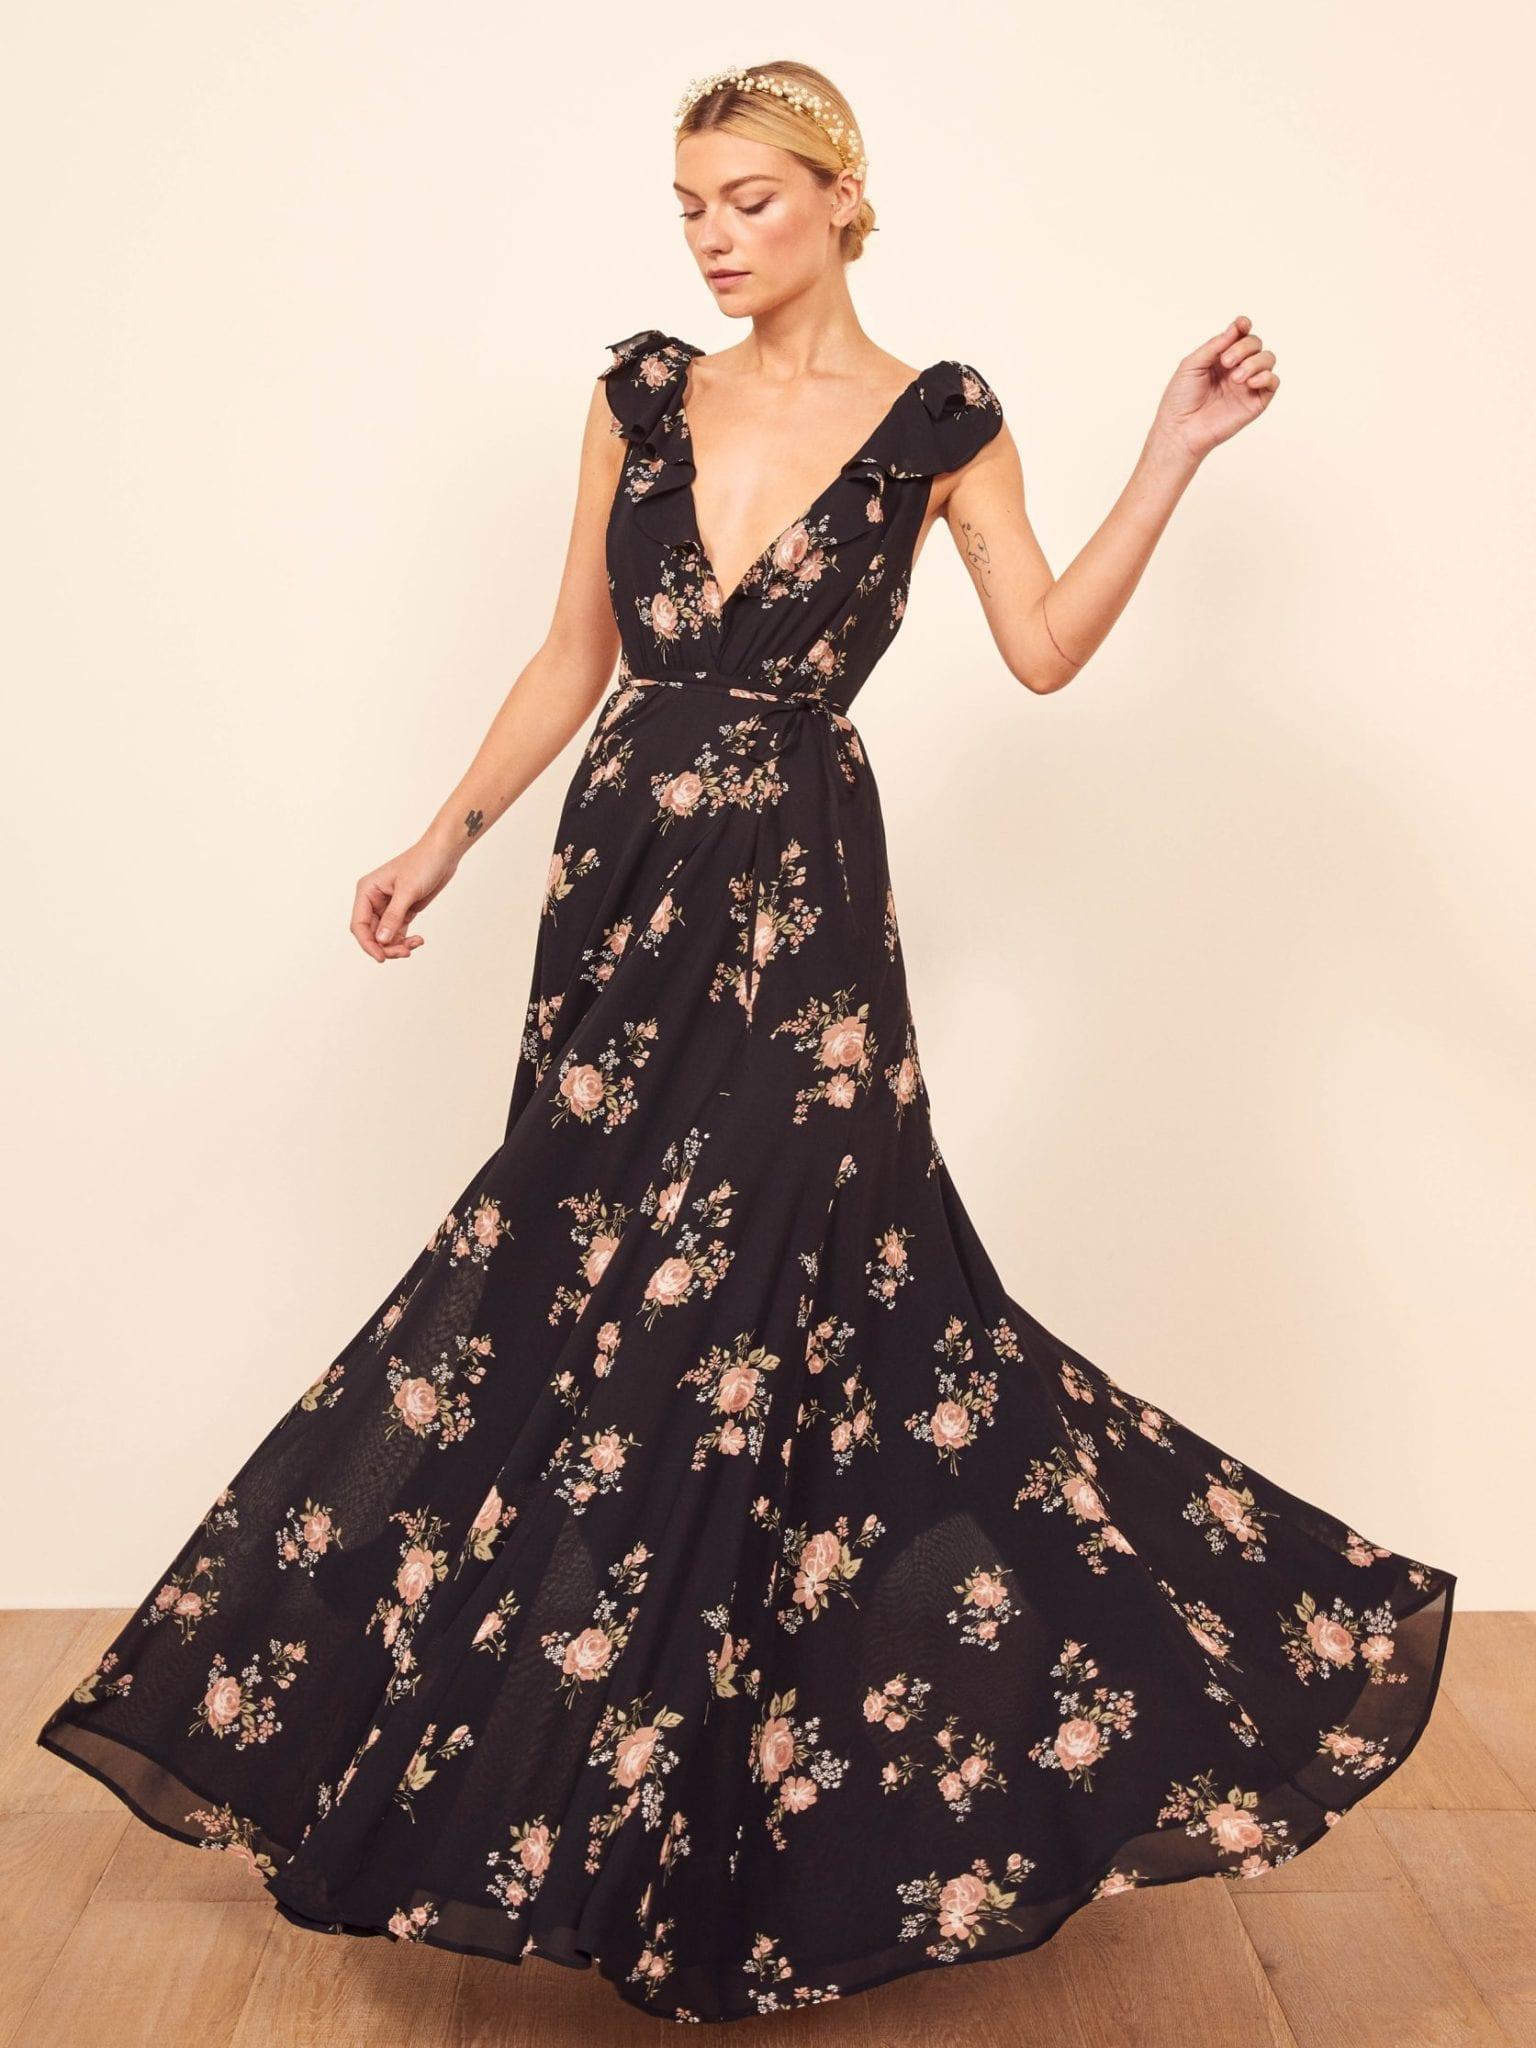 REFORMATION Peppermint Dress